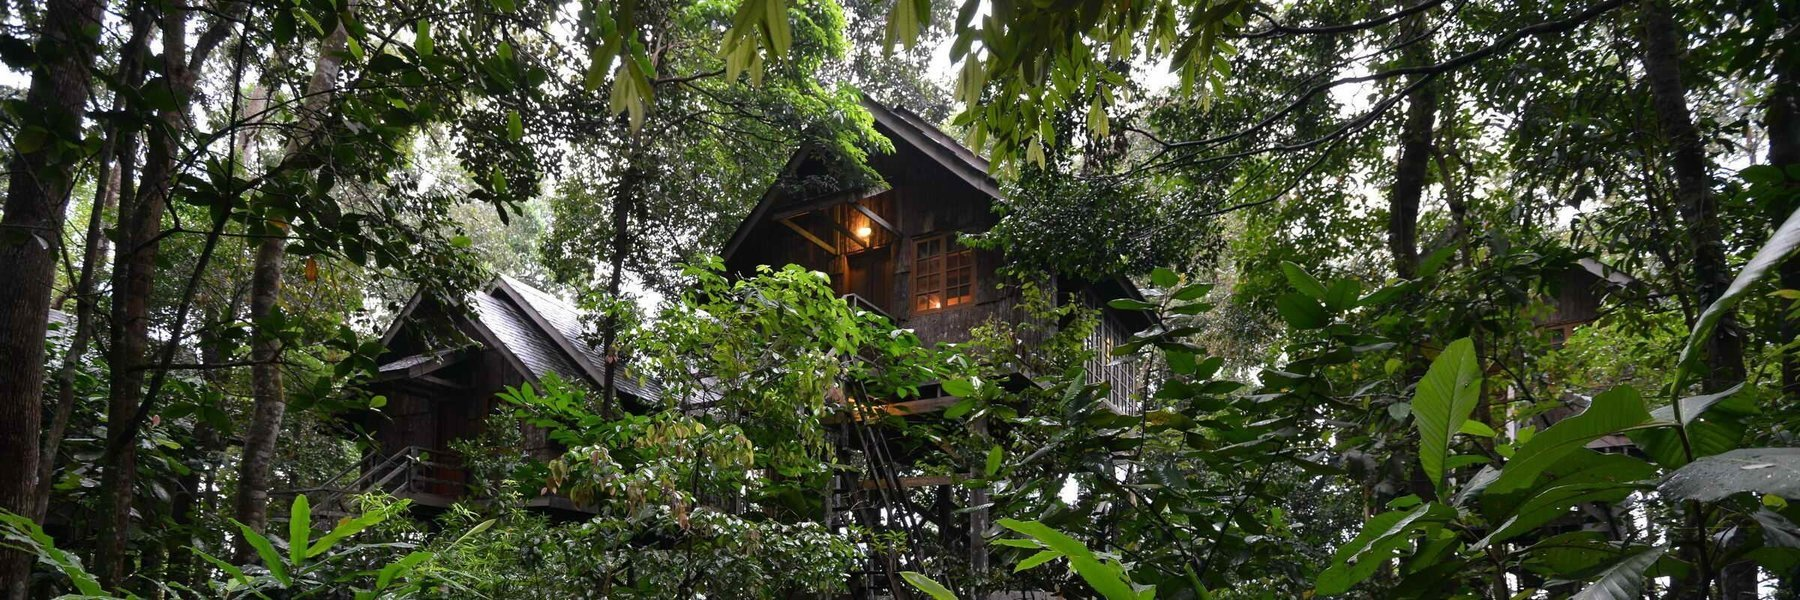 Explore Kuching and Permai Rainforest - Tour